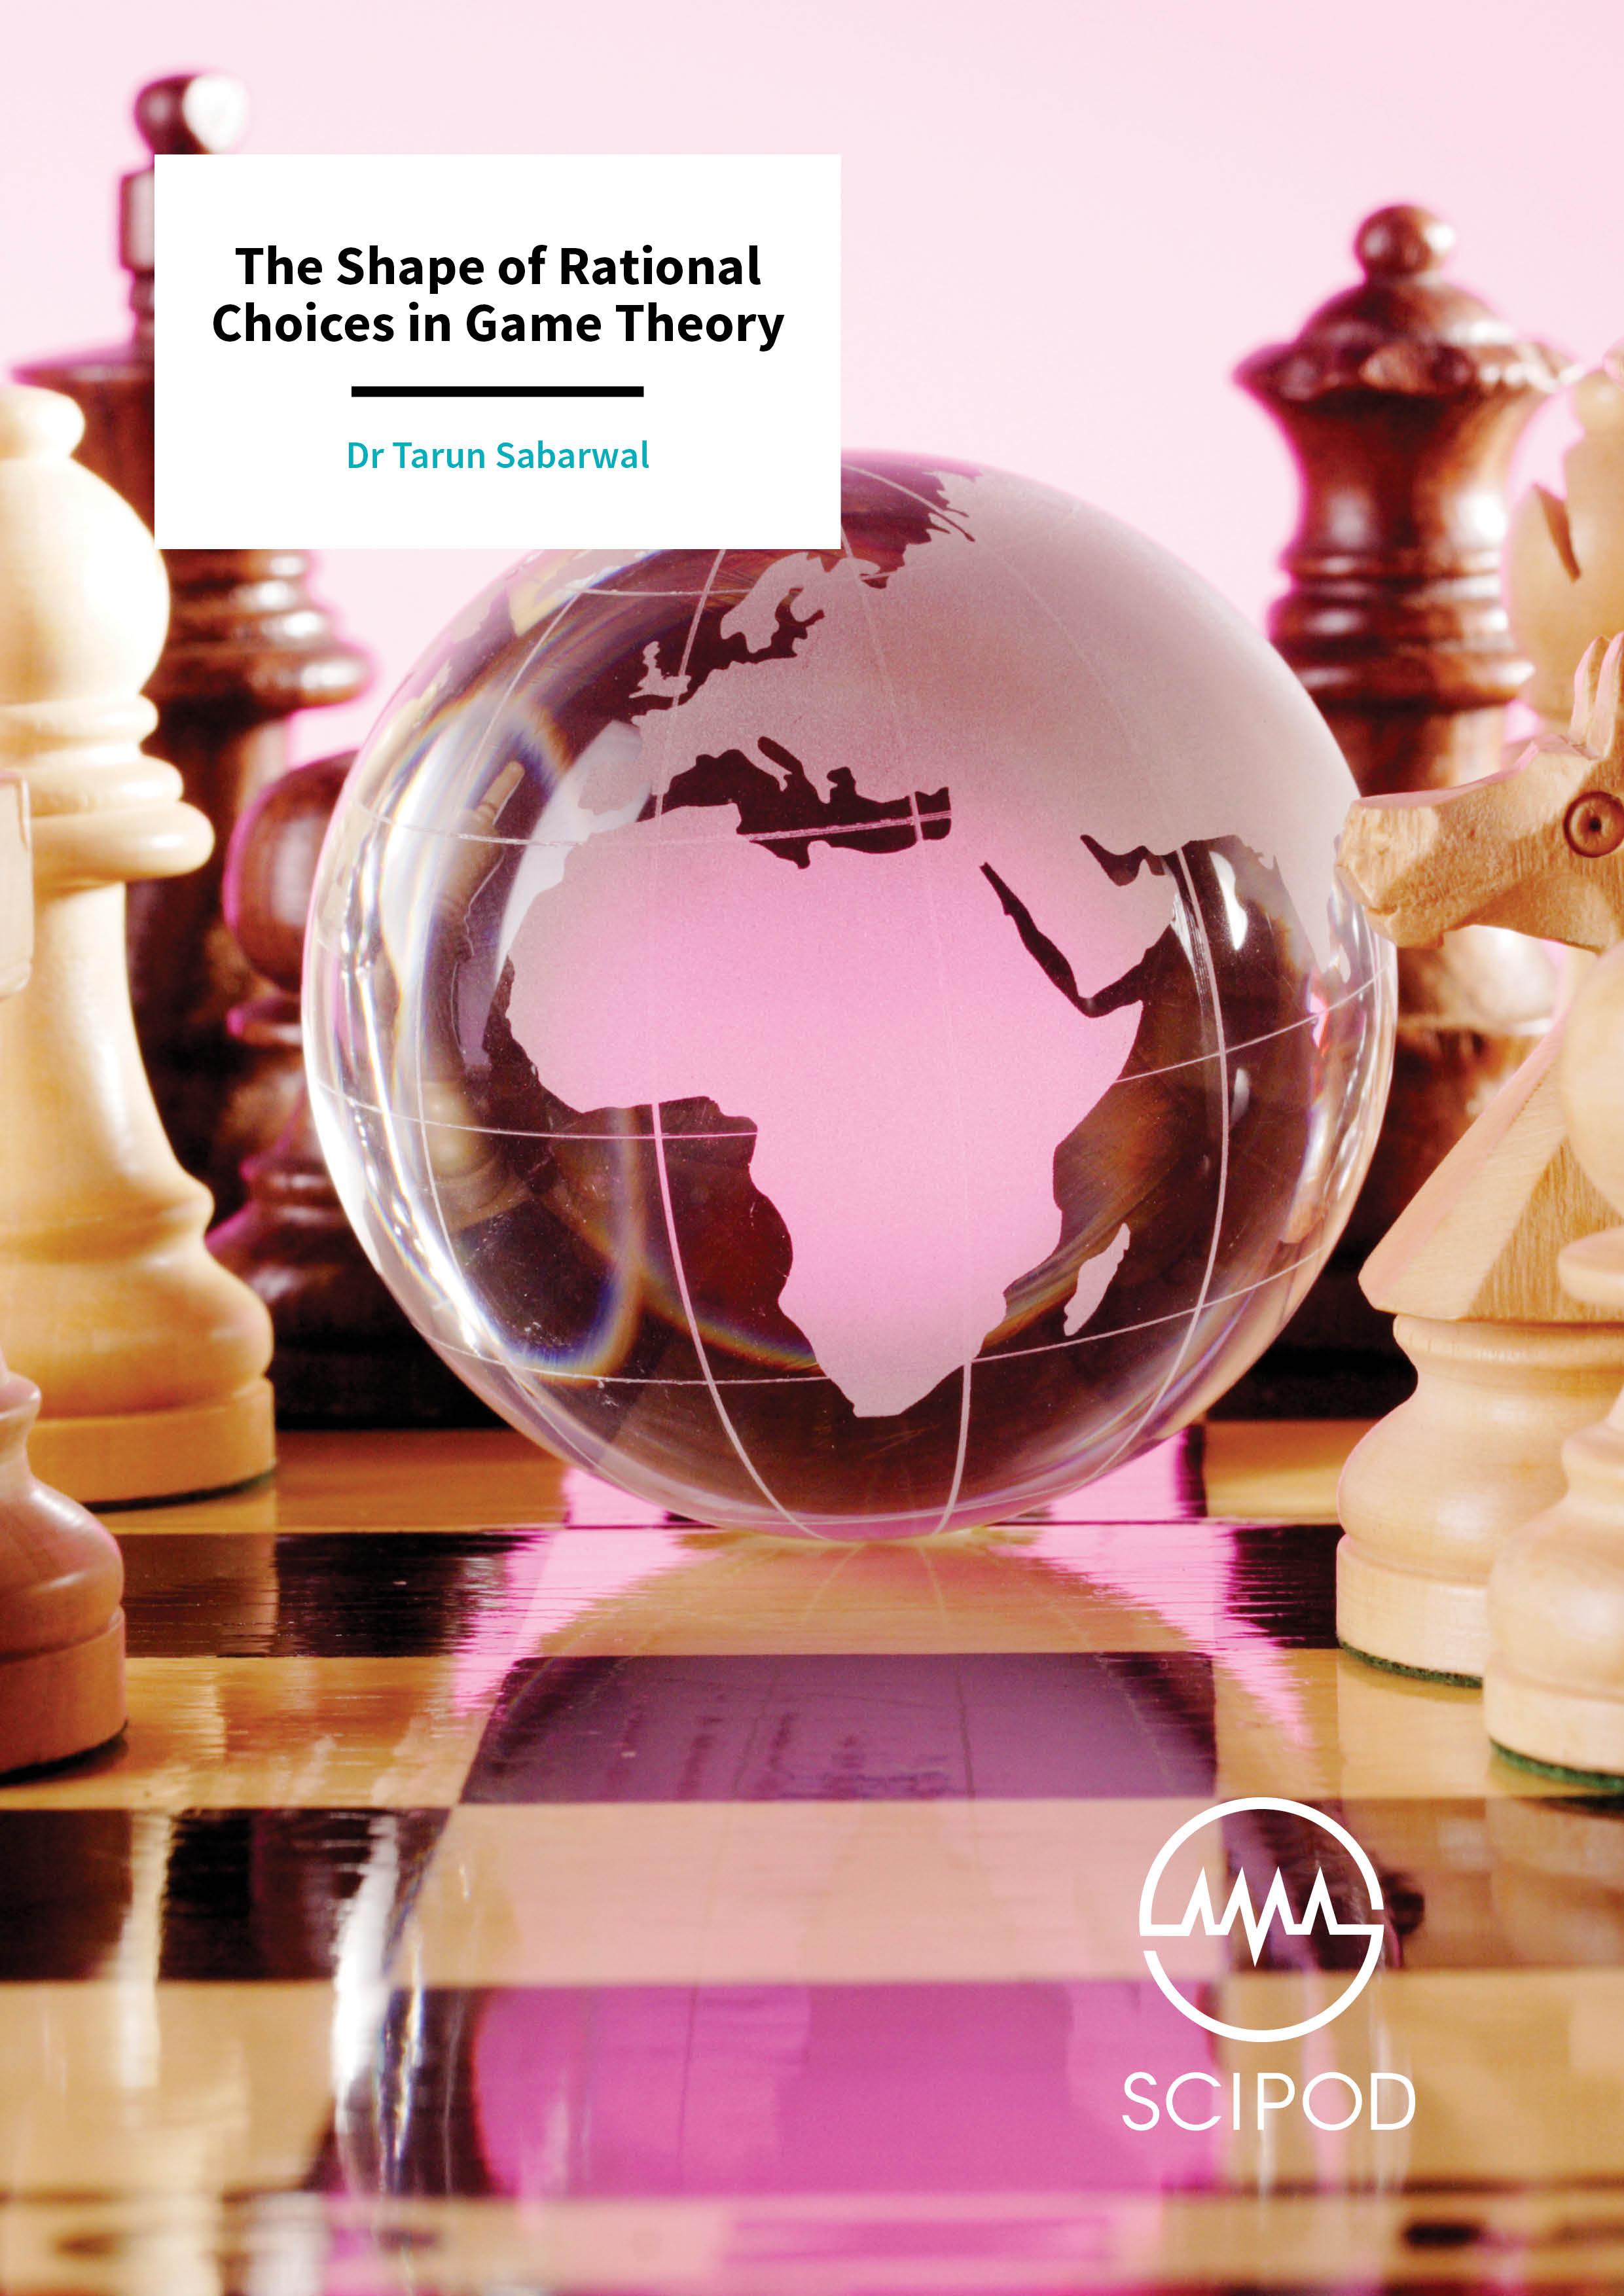 The Shape of Rational Choices in Game Theory – Dr Tarun Sabarwal, University of Kansas